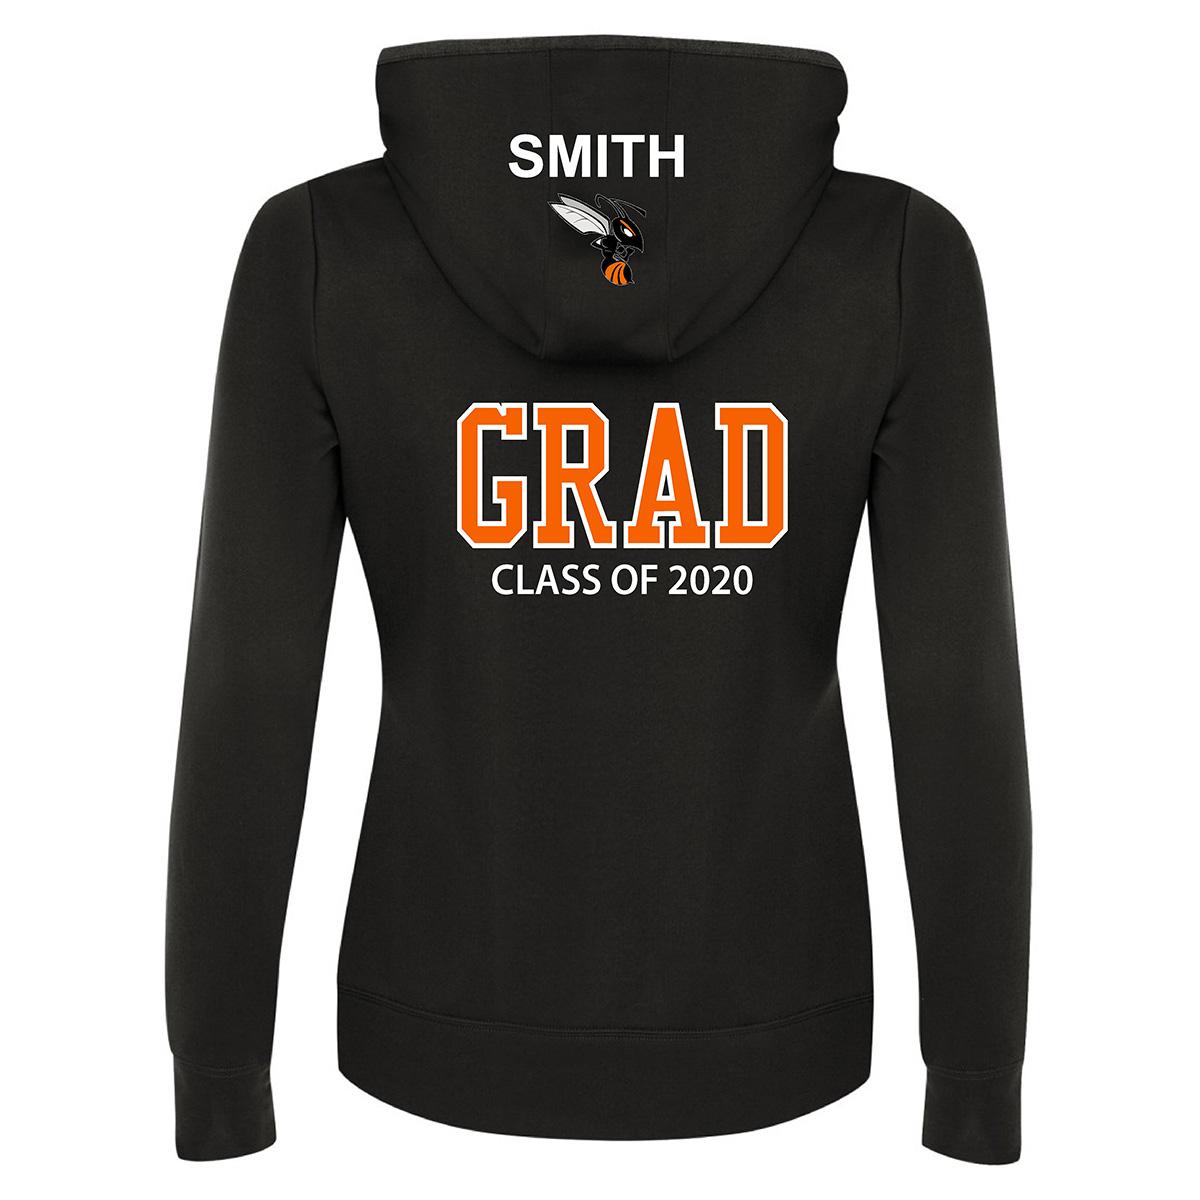 Stamford Gradhoodies